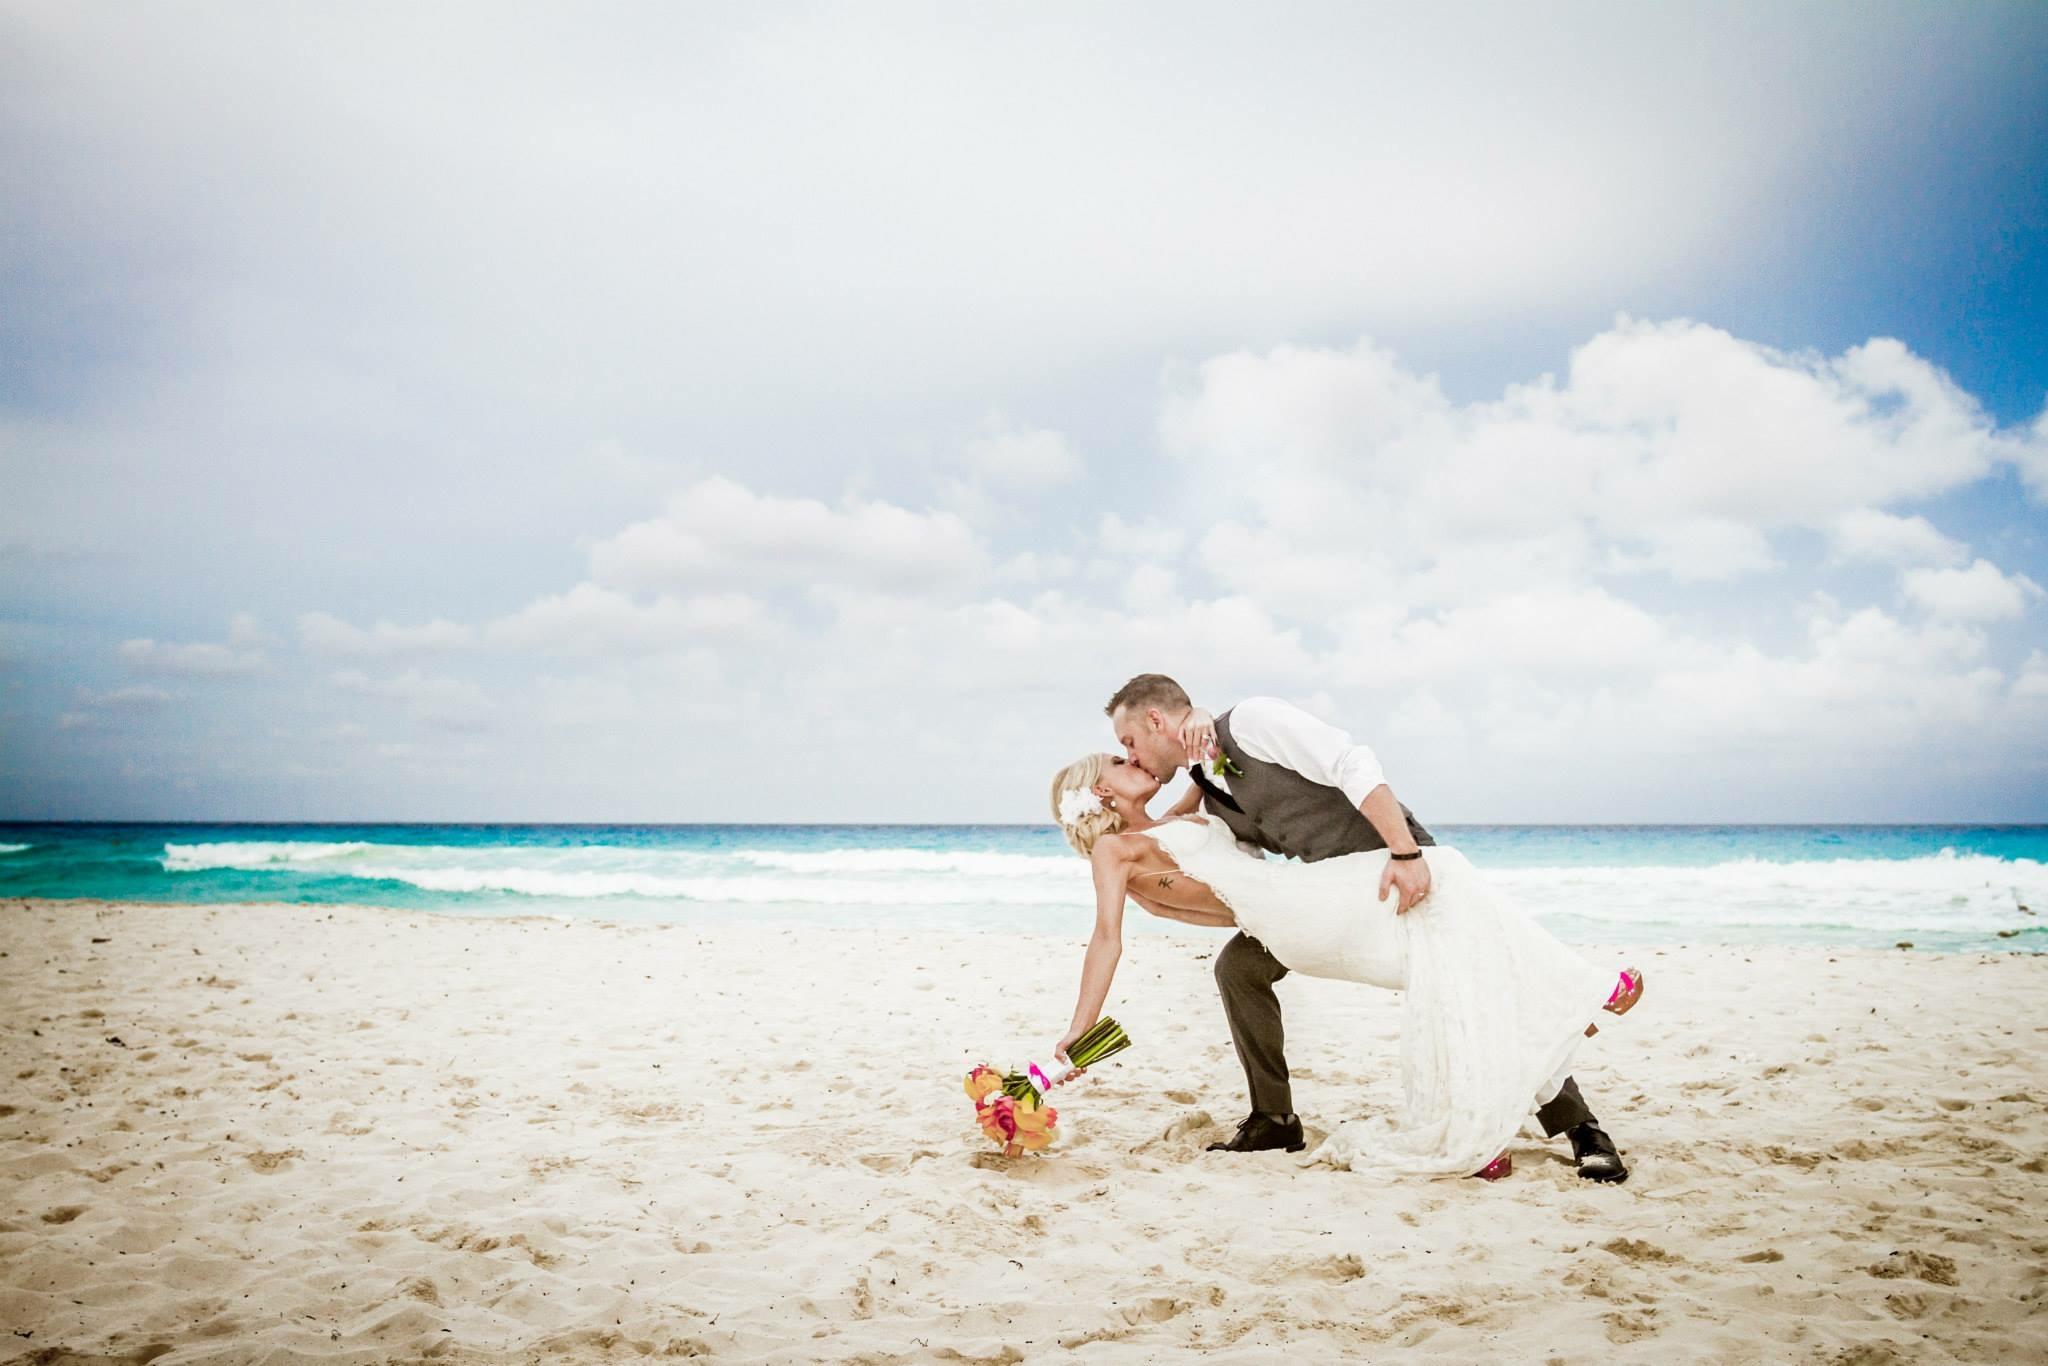 krysten-reed-cancun-beach-wedding-19.JPG